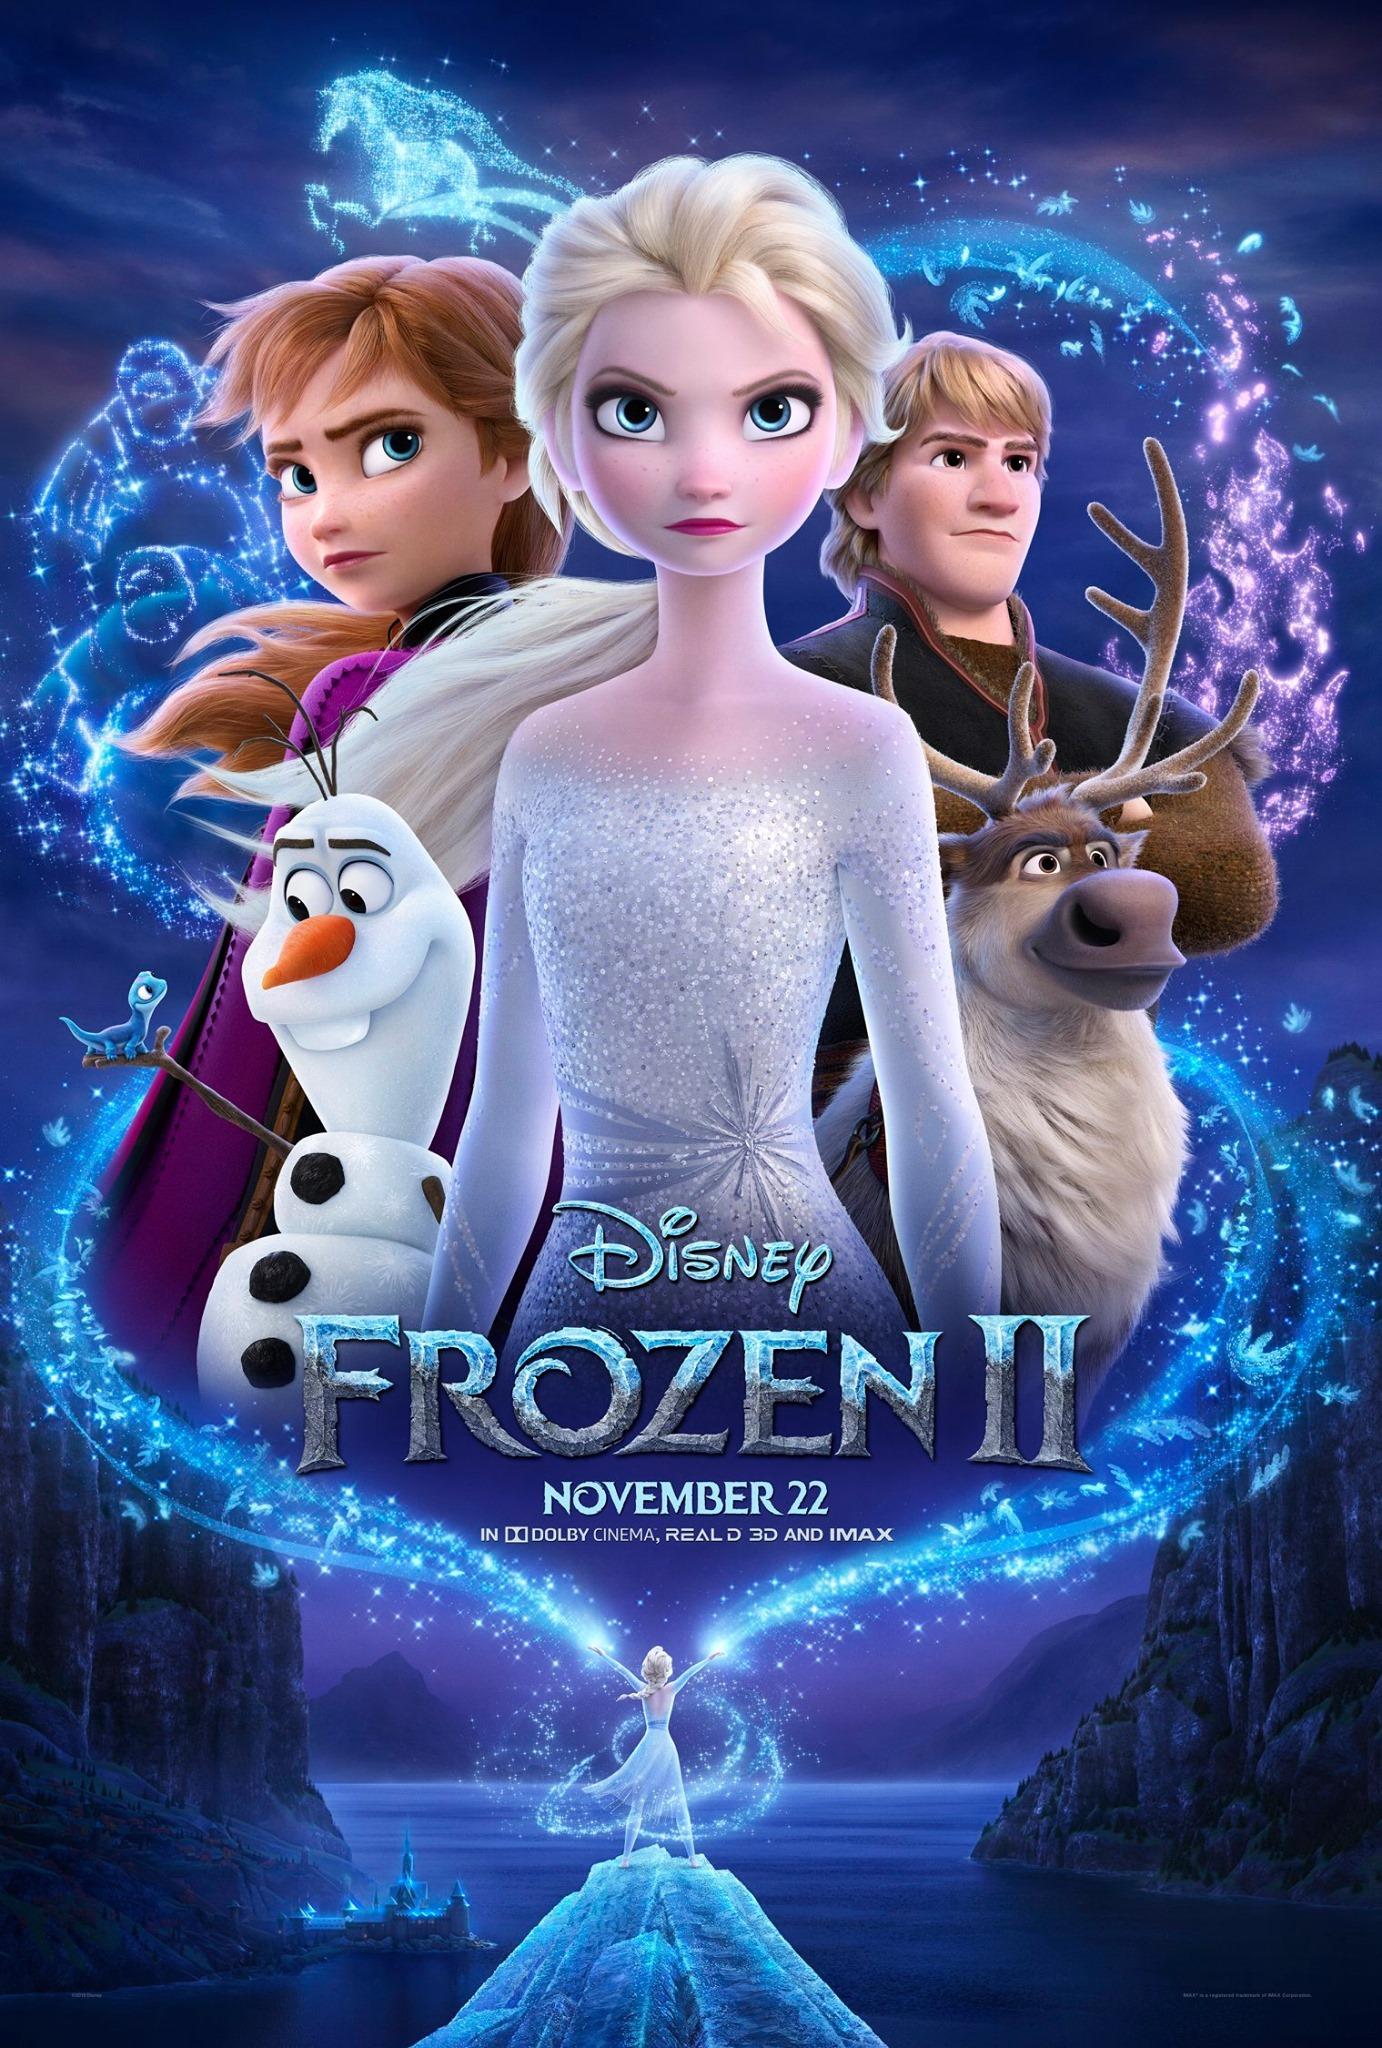 szmk_frozen_two_jegvarazs_2_anna_elza_elsa_olaf_swen_christoph_legyen_ho_arendelle_into_the_unknown_disney_5.jpg